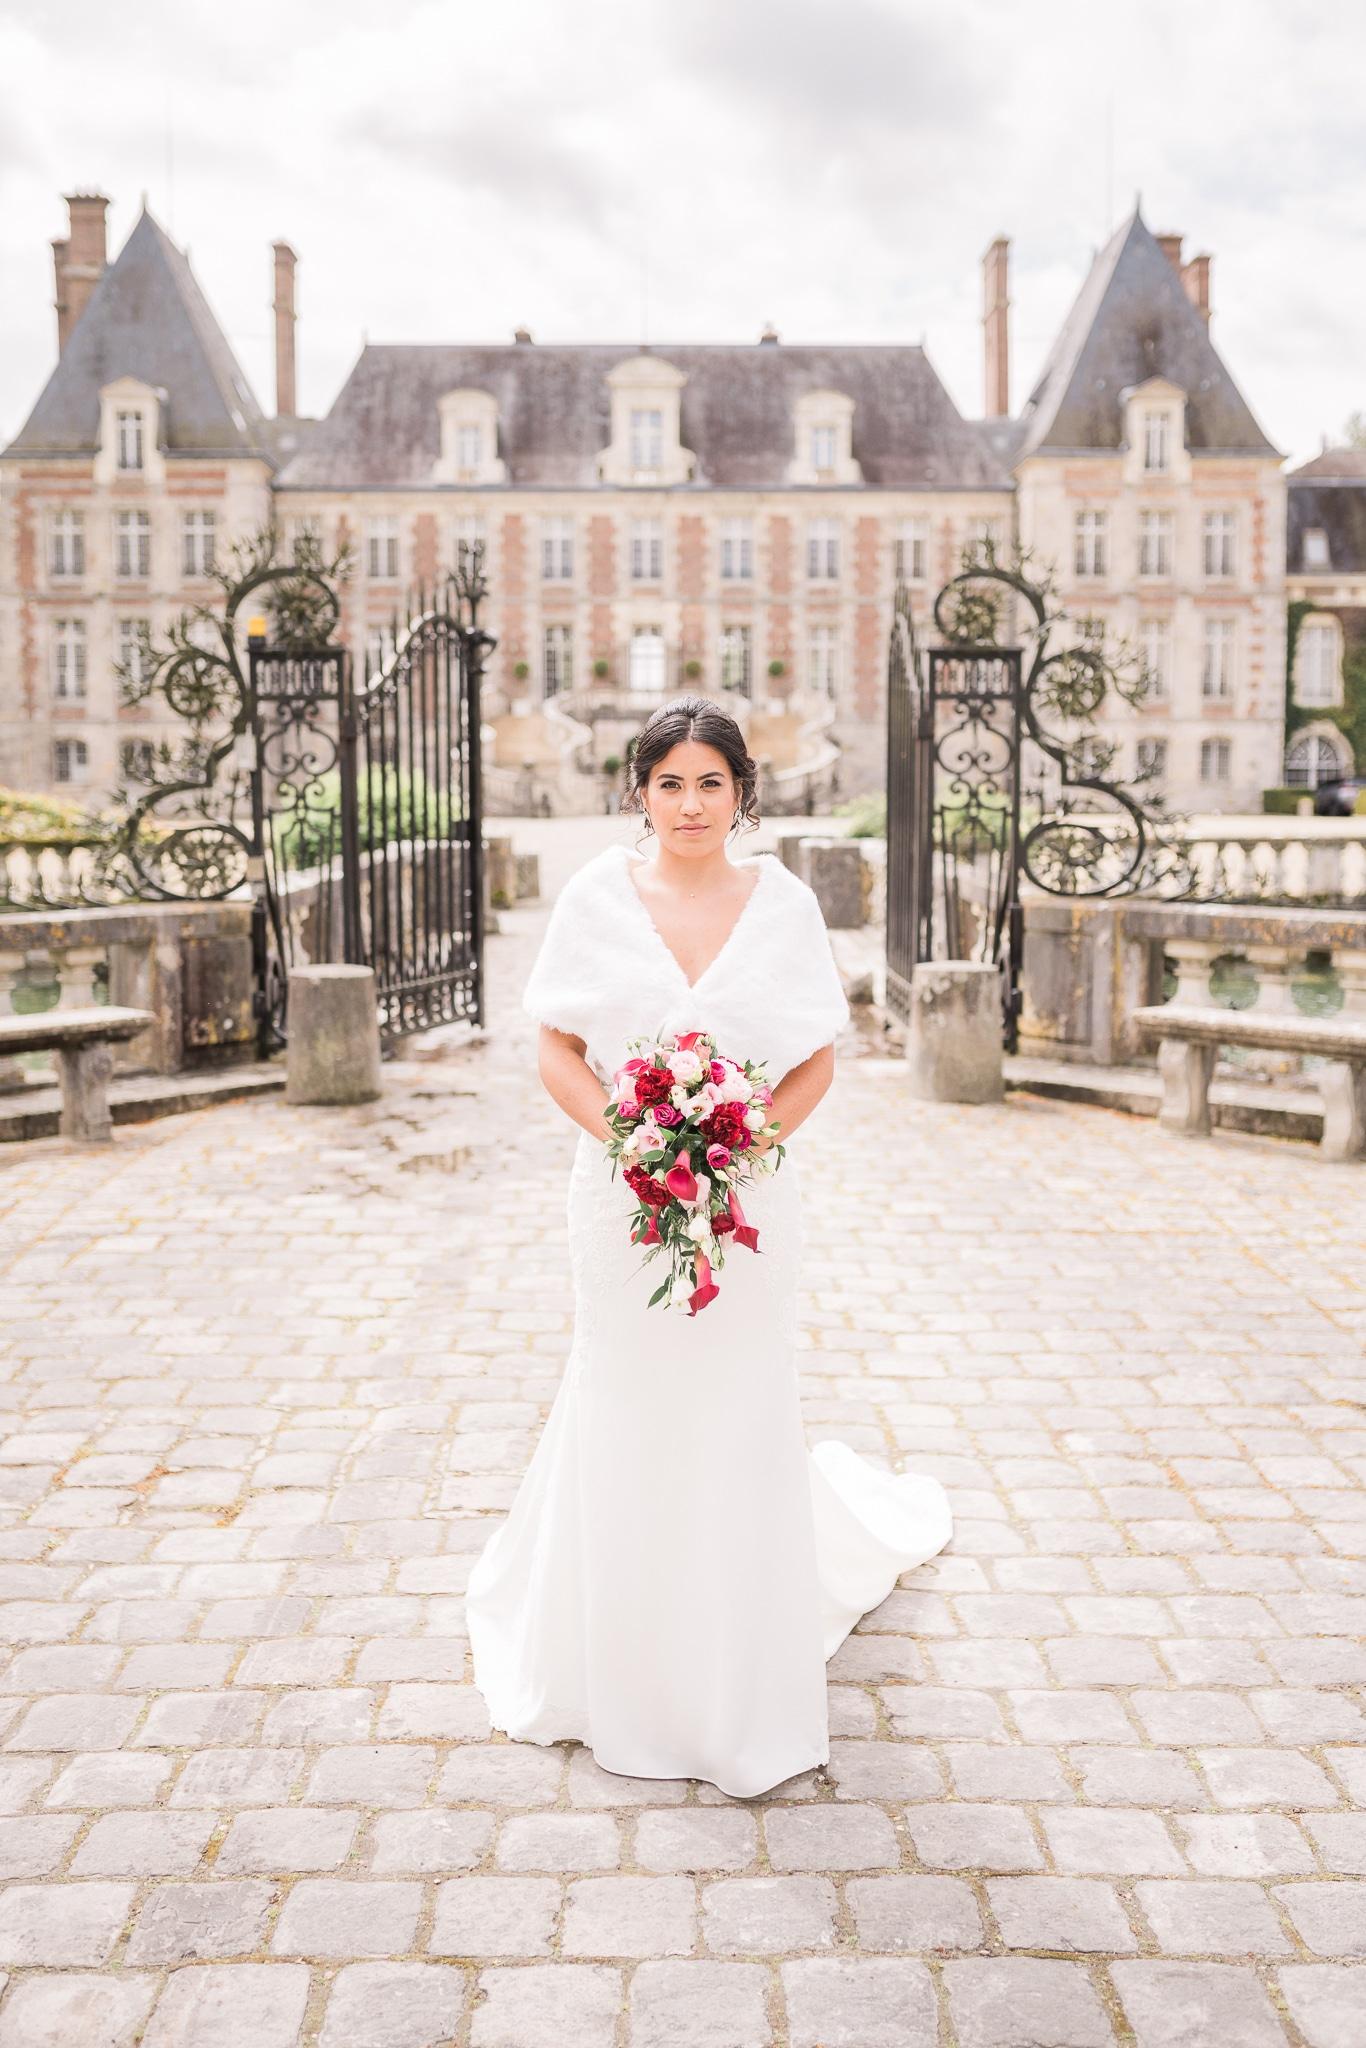 Mariage Blandine & remy pascal canovas photographe fineart